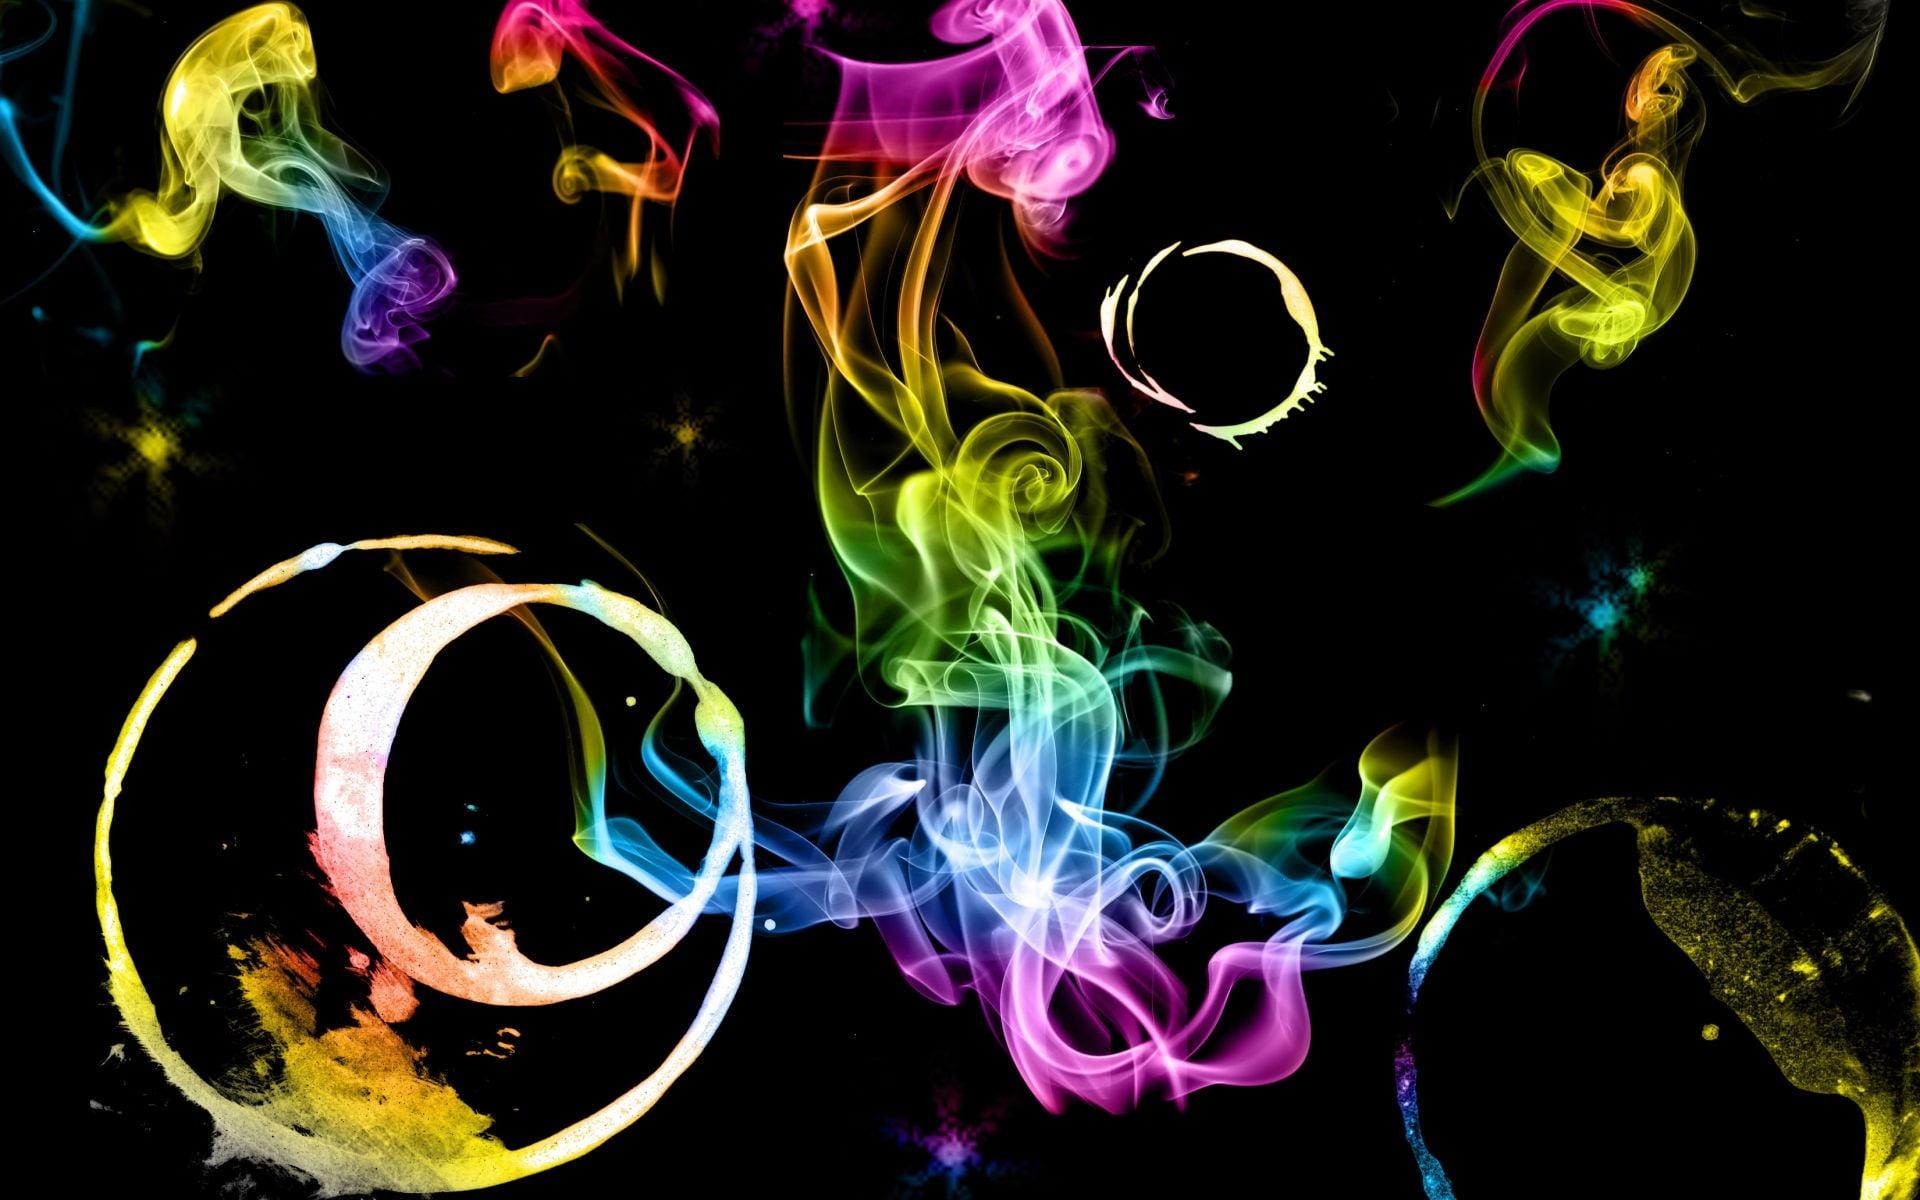 Multicolored smoke digital wallpaper HD wallpaper | Wallpaper Flare